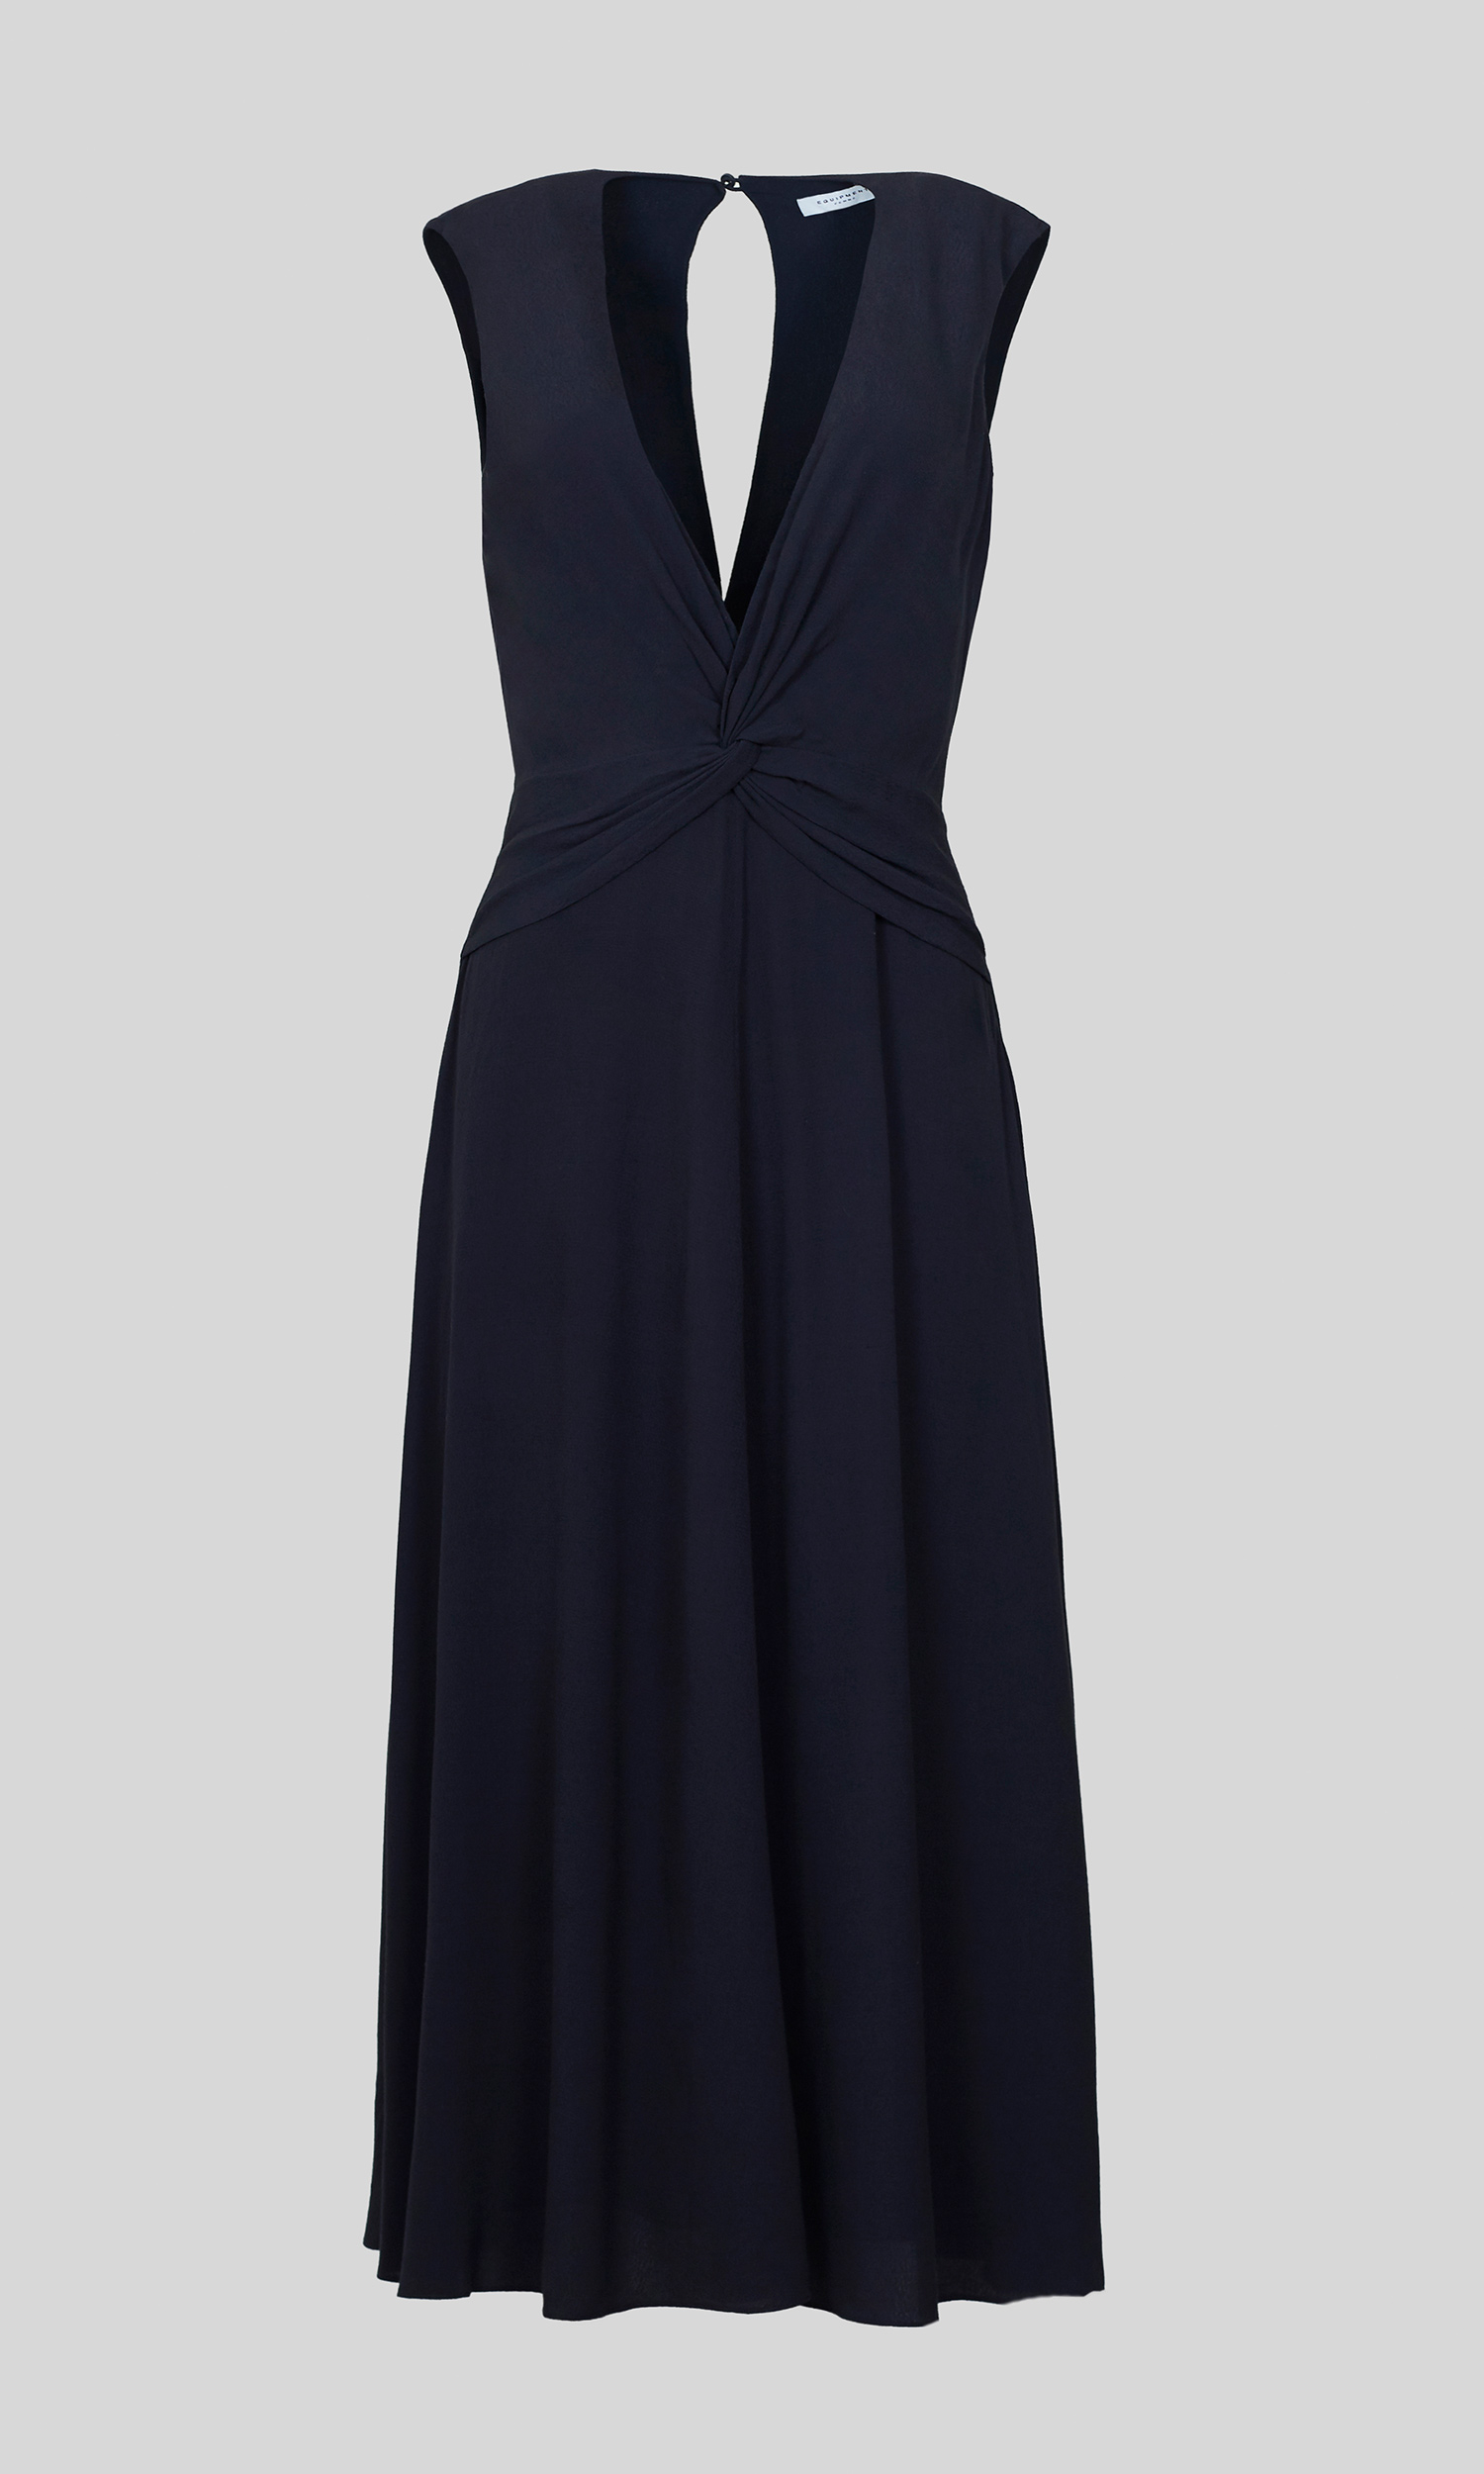 Sleeveless Faun Dress by Equipment